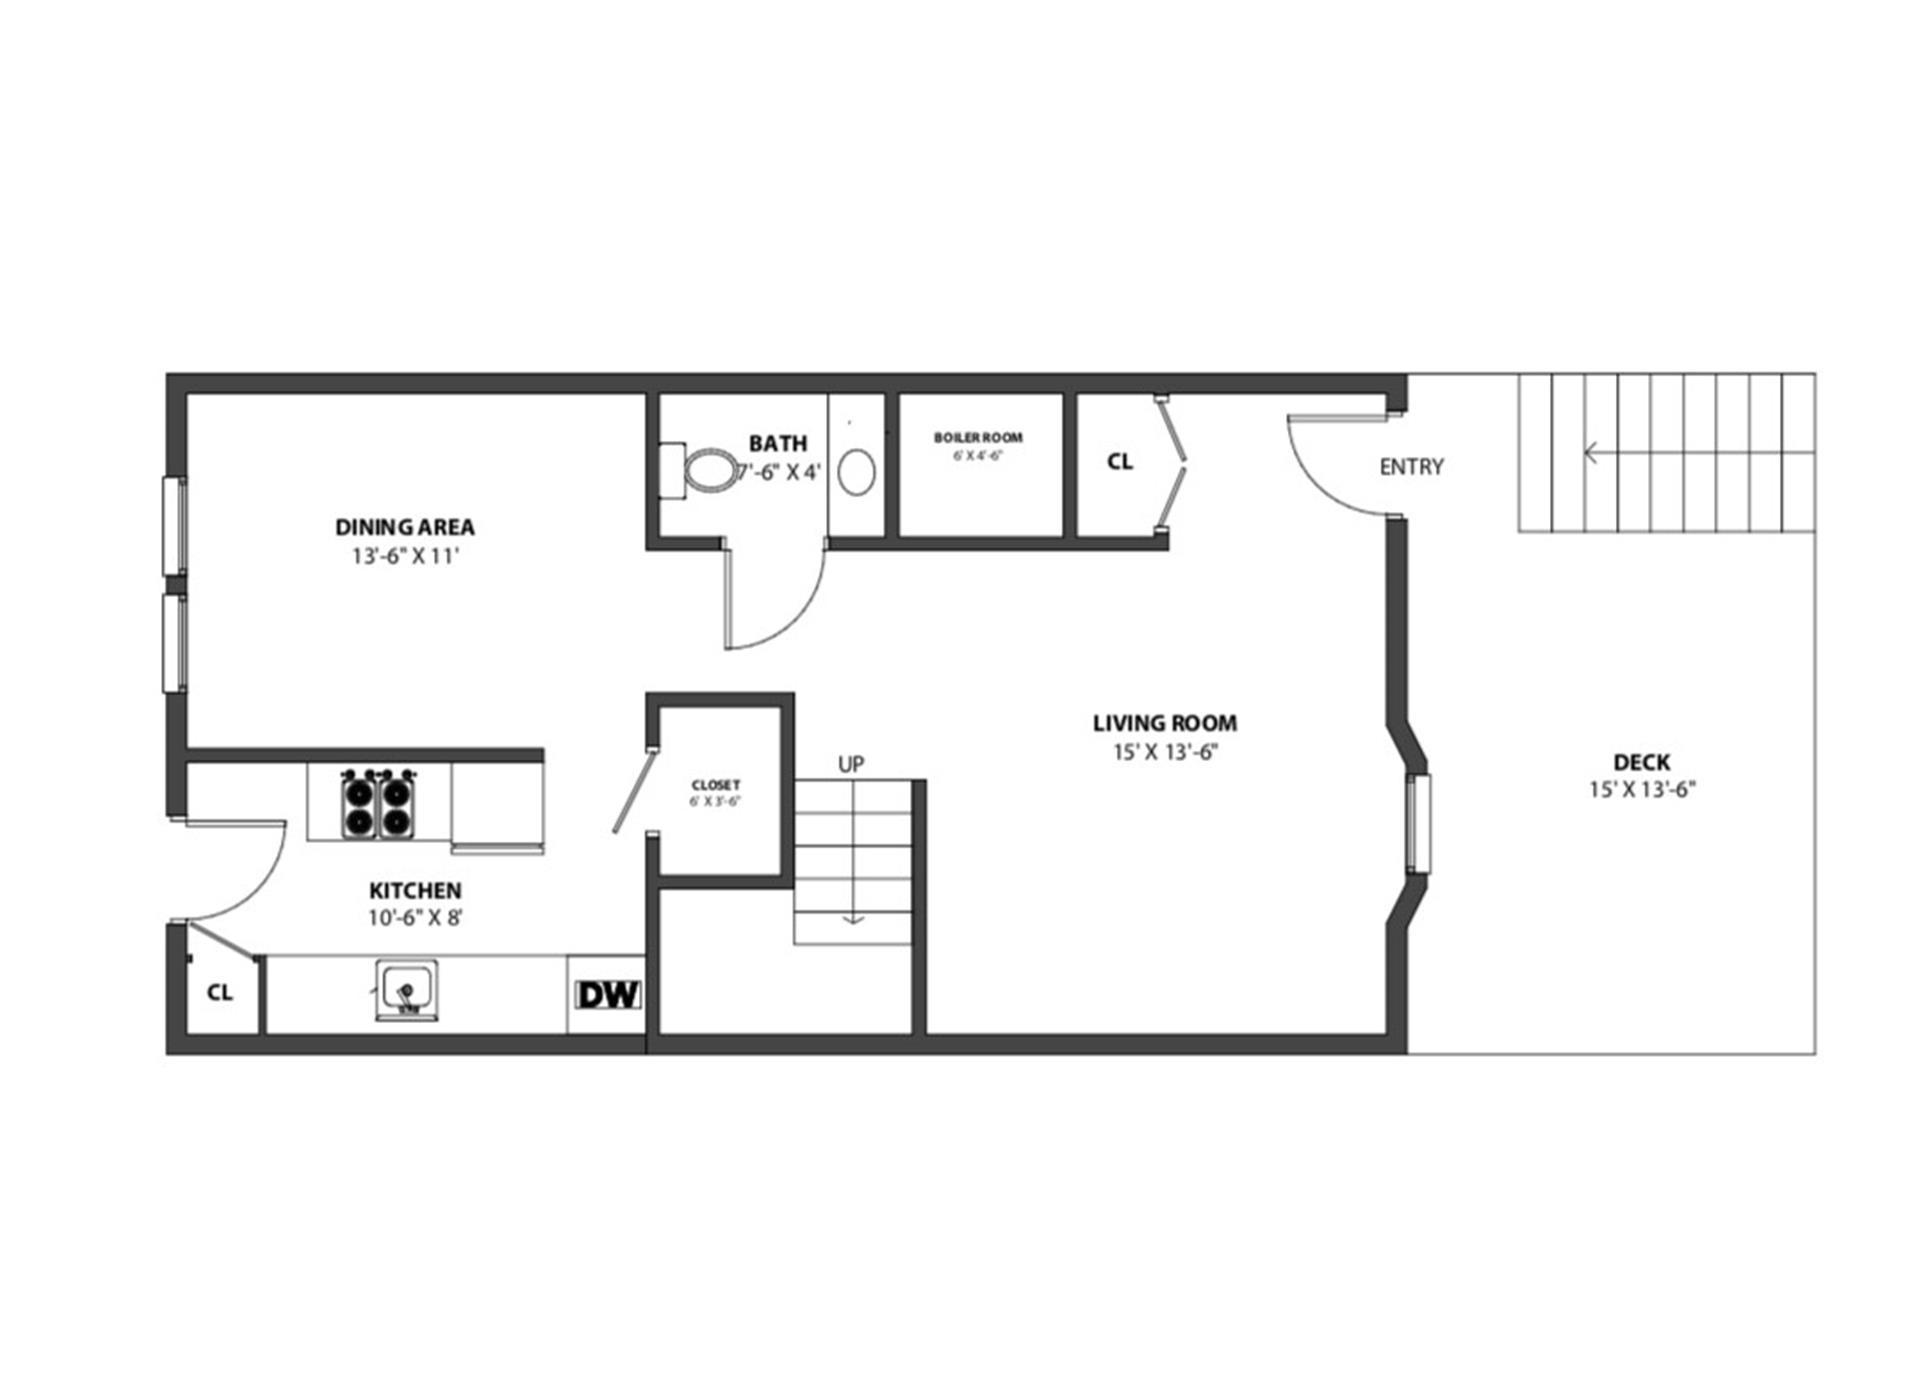 Floor plan of 577 Cauldwell Avenue - Mott Haven, New York